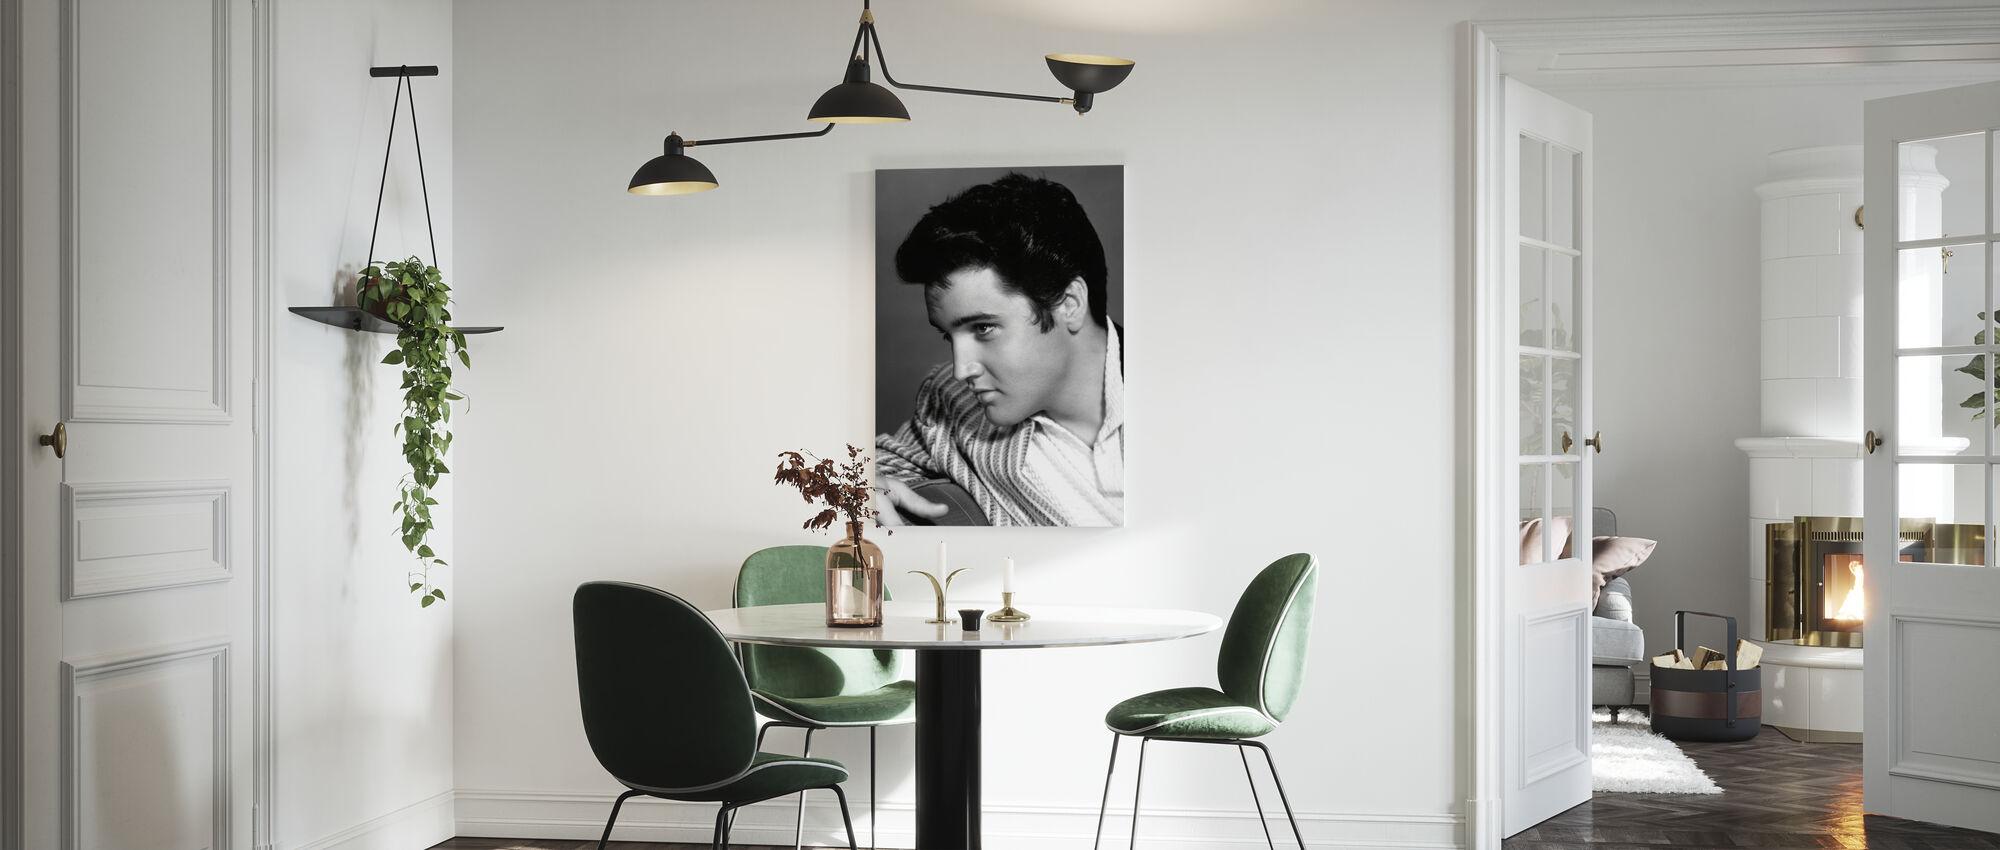 Elvis Presley - Leinwandbild - Küchen